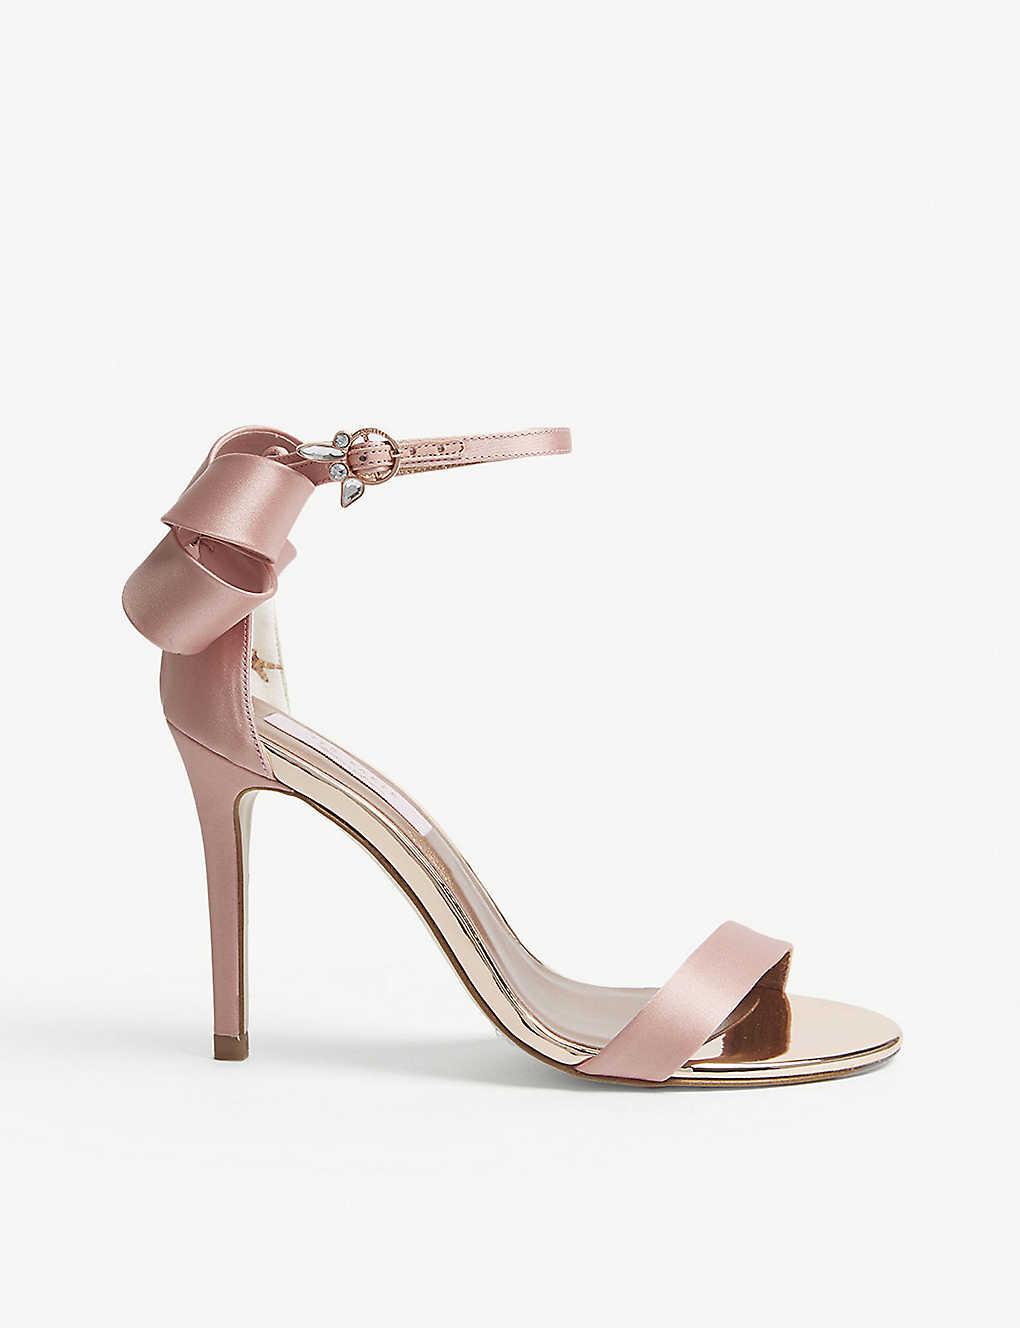 7fd457f24 TED BAKER - Sandalc bow satin sandals